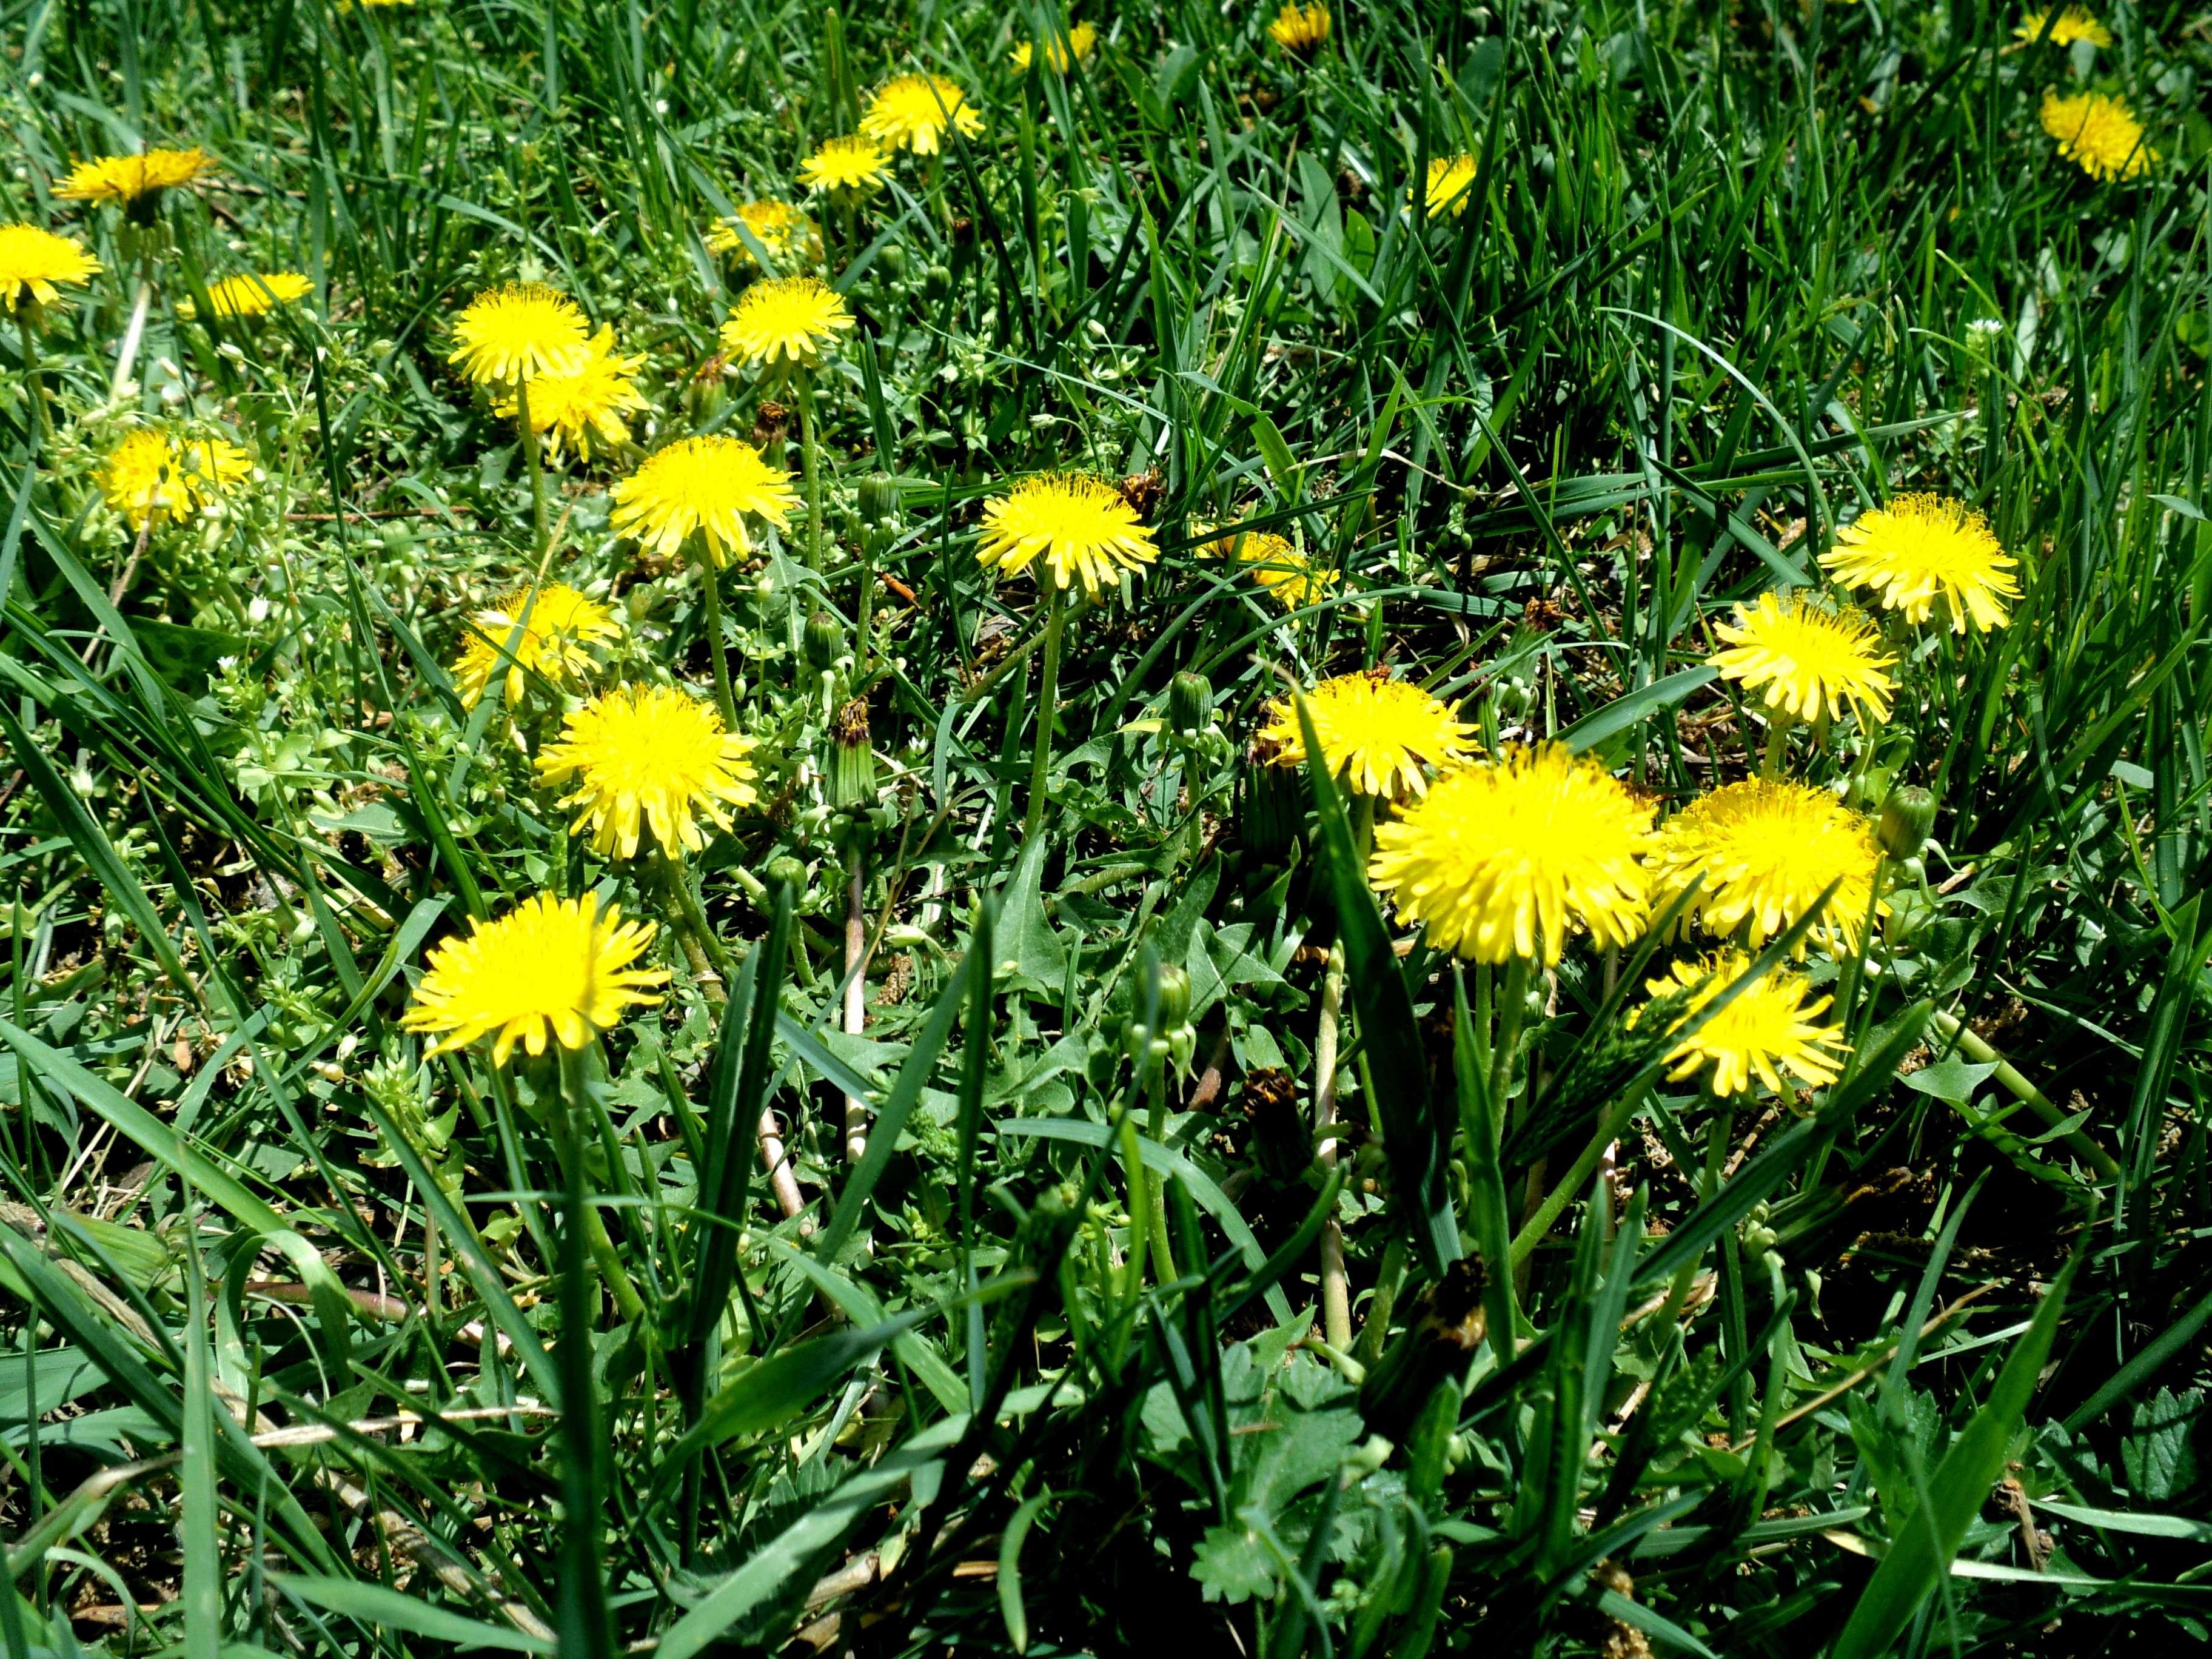 Dandelions in grass